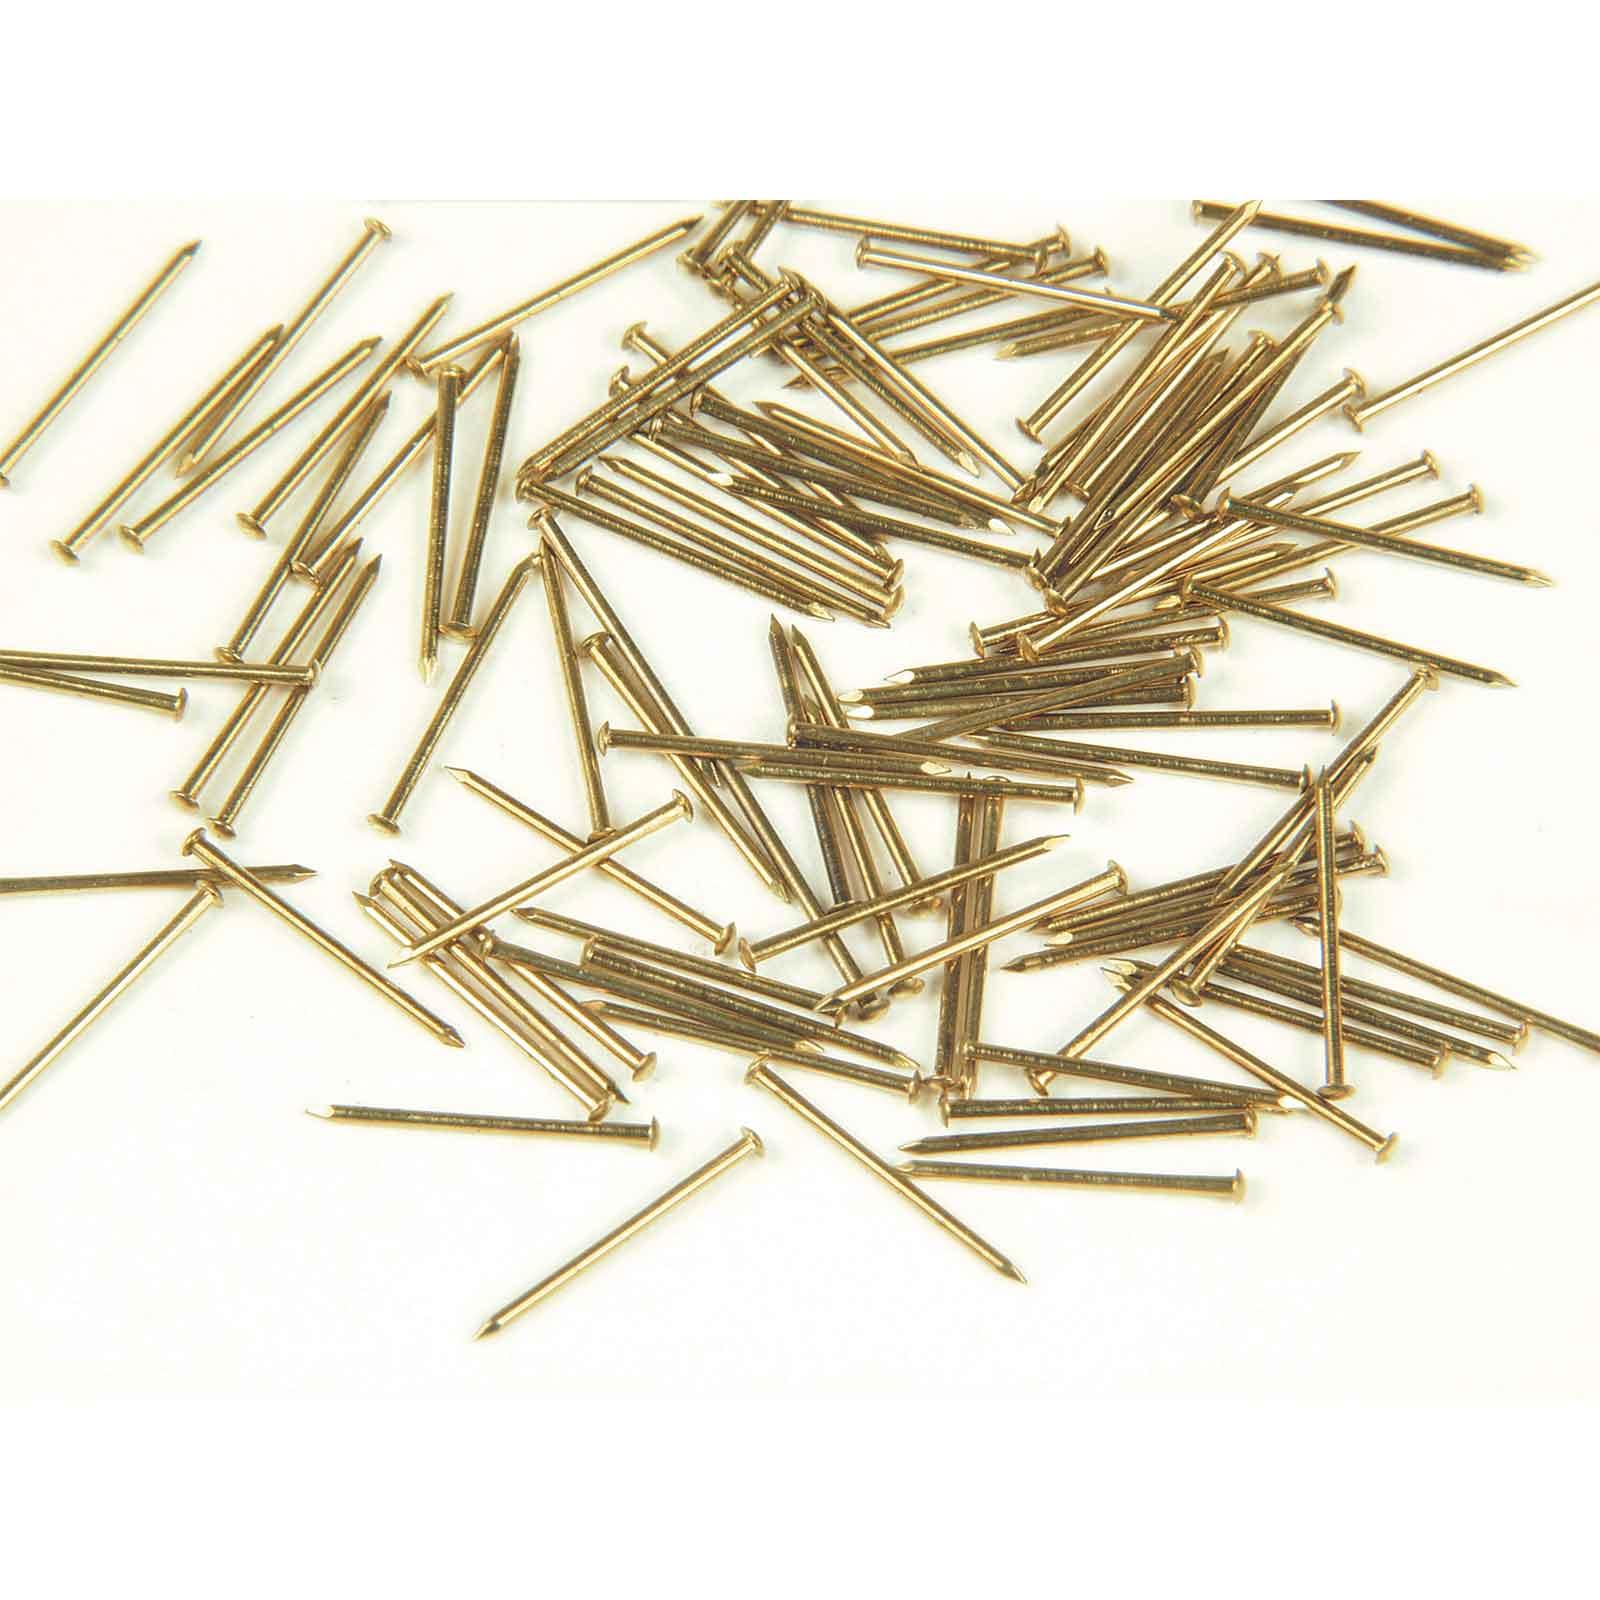 Dollhouse Miniature Brass Mini Nails 3//32 in long